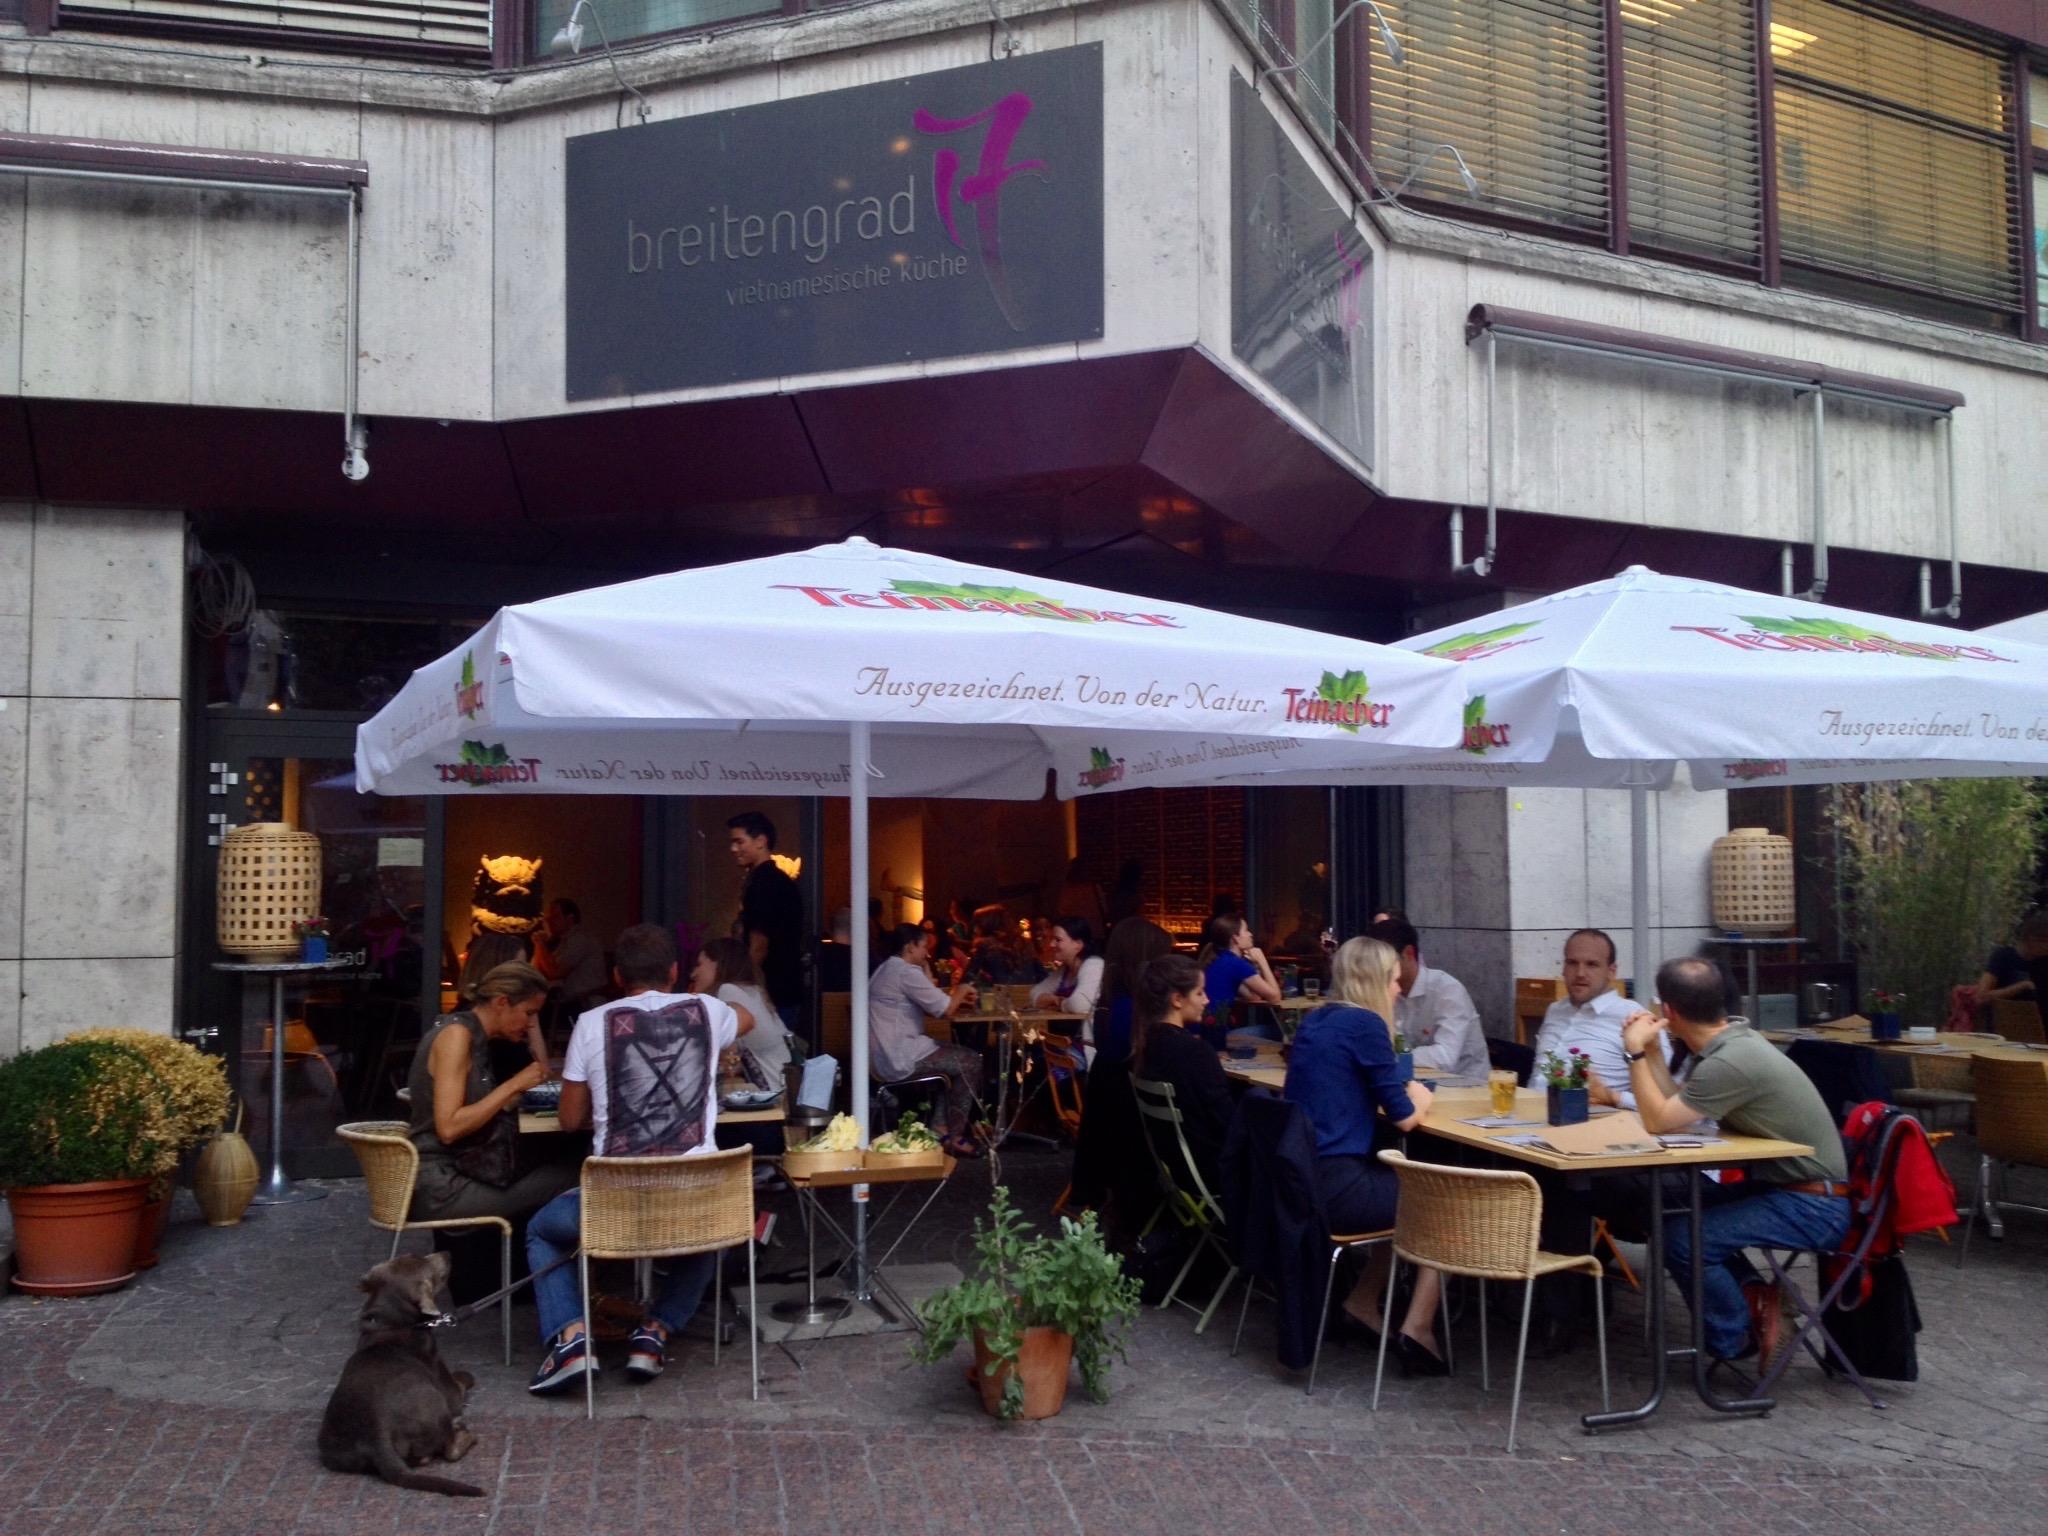 The patio at  Breitengrad 17 's new location